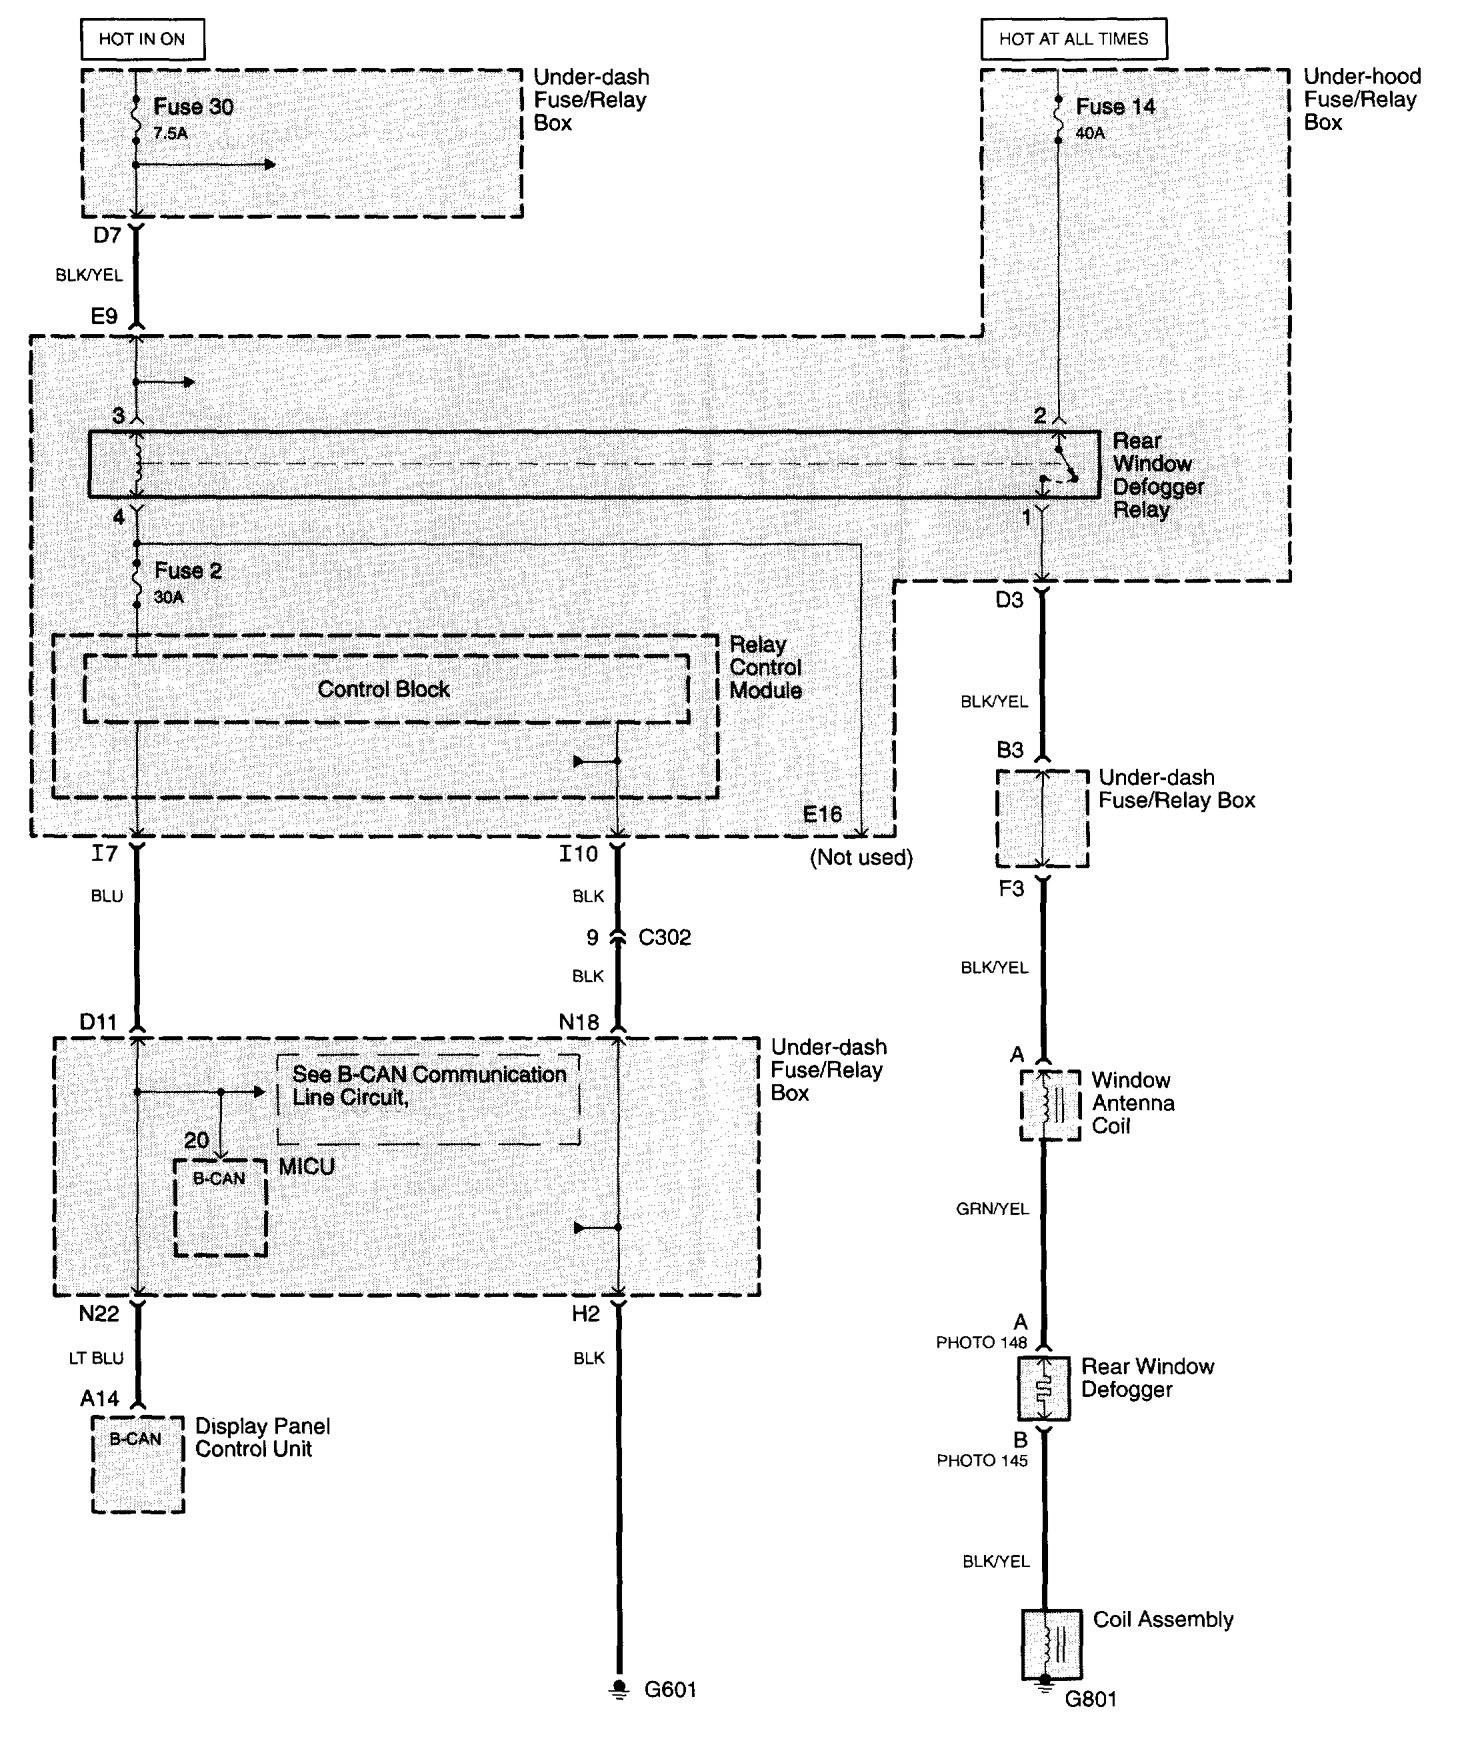 Amp Wiring Diagram 2005 Acura Tl / Amp Wiring Diagram